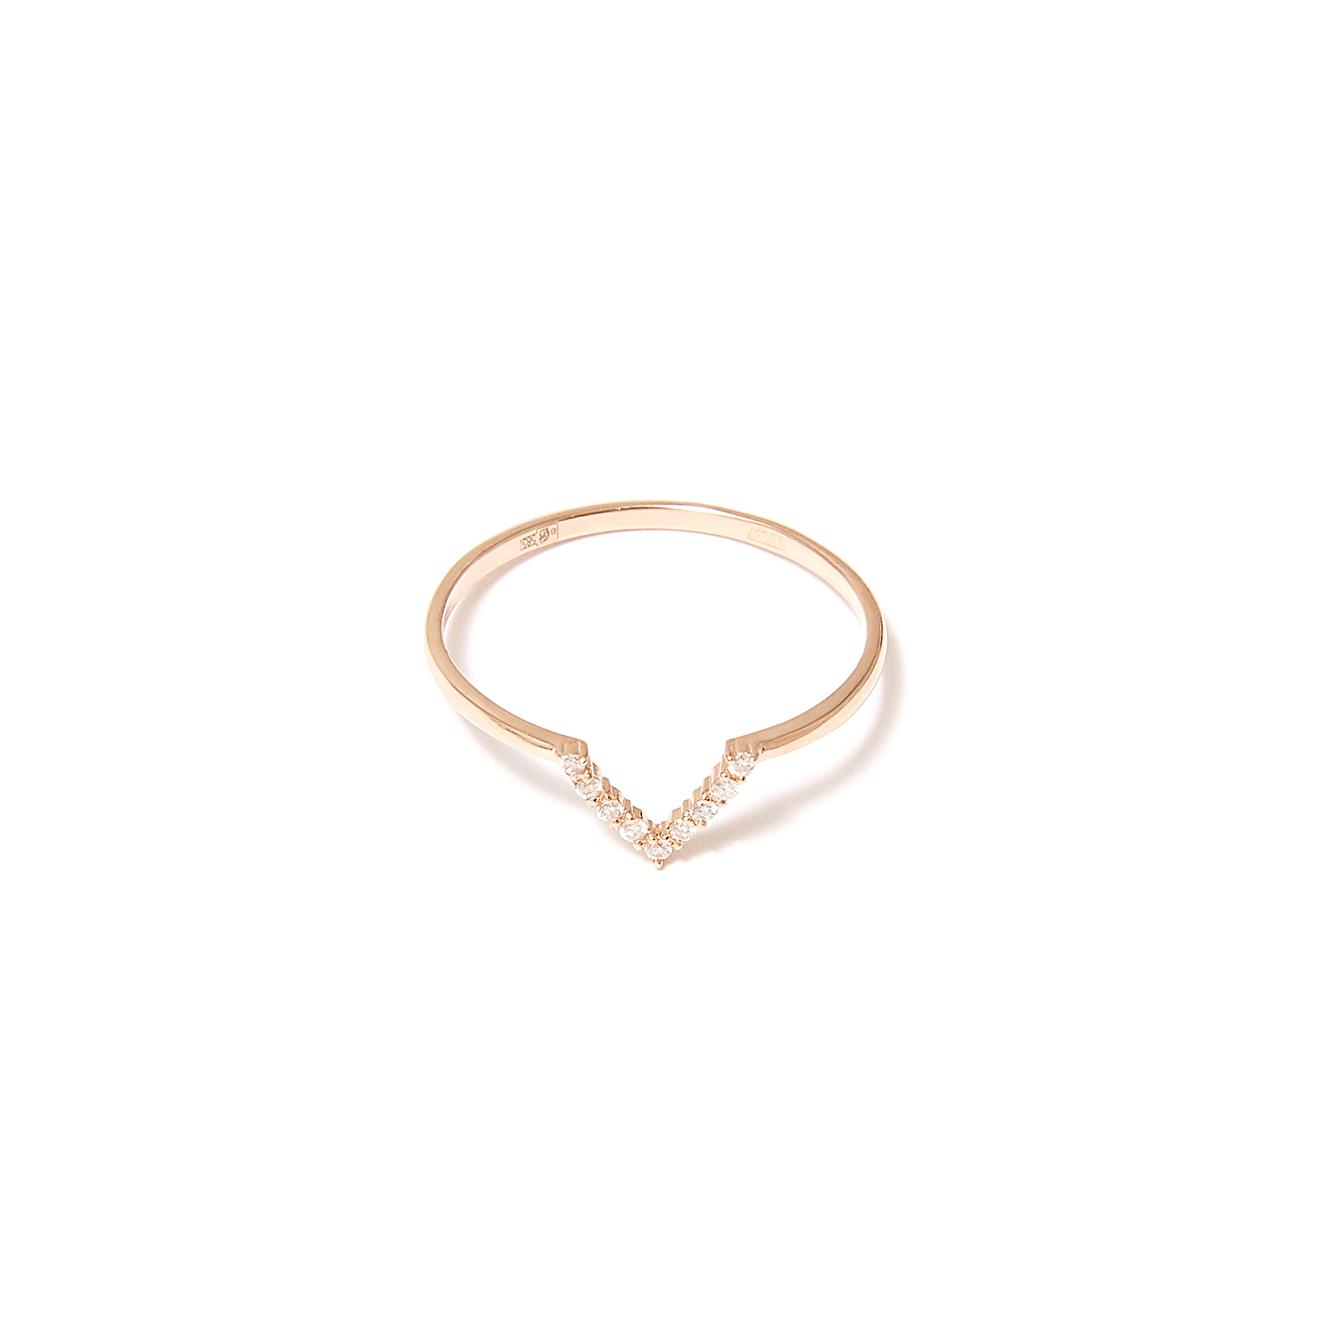 Moonka studio Золотое кольцо с бриллиантами, из коллекции Opalescence